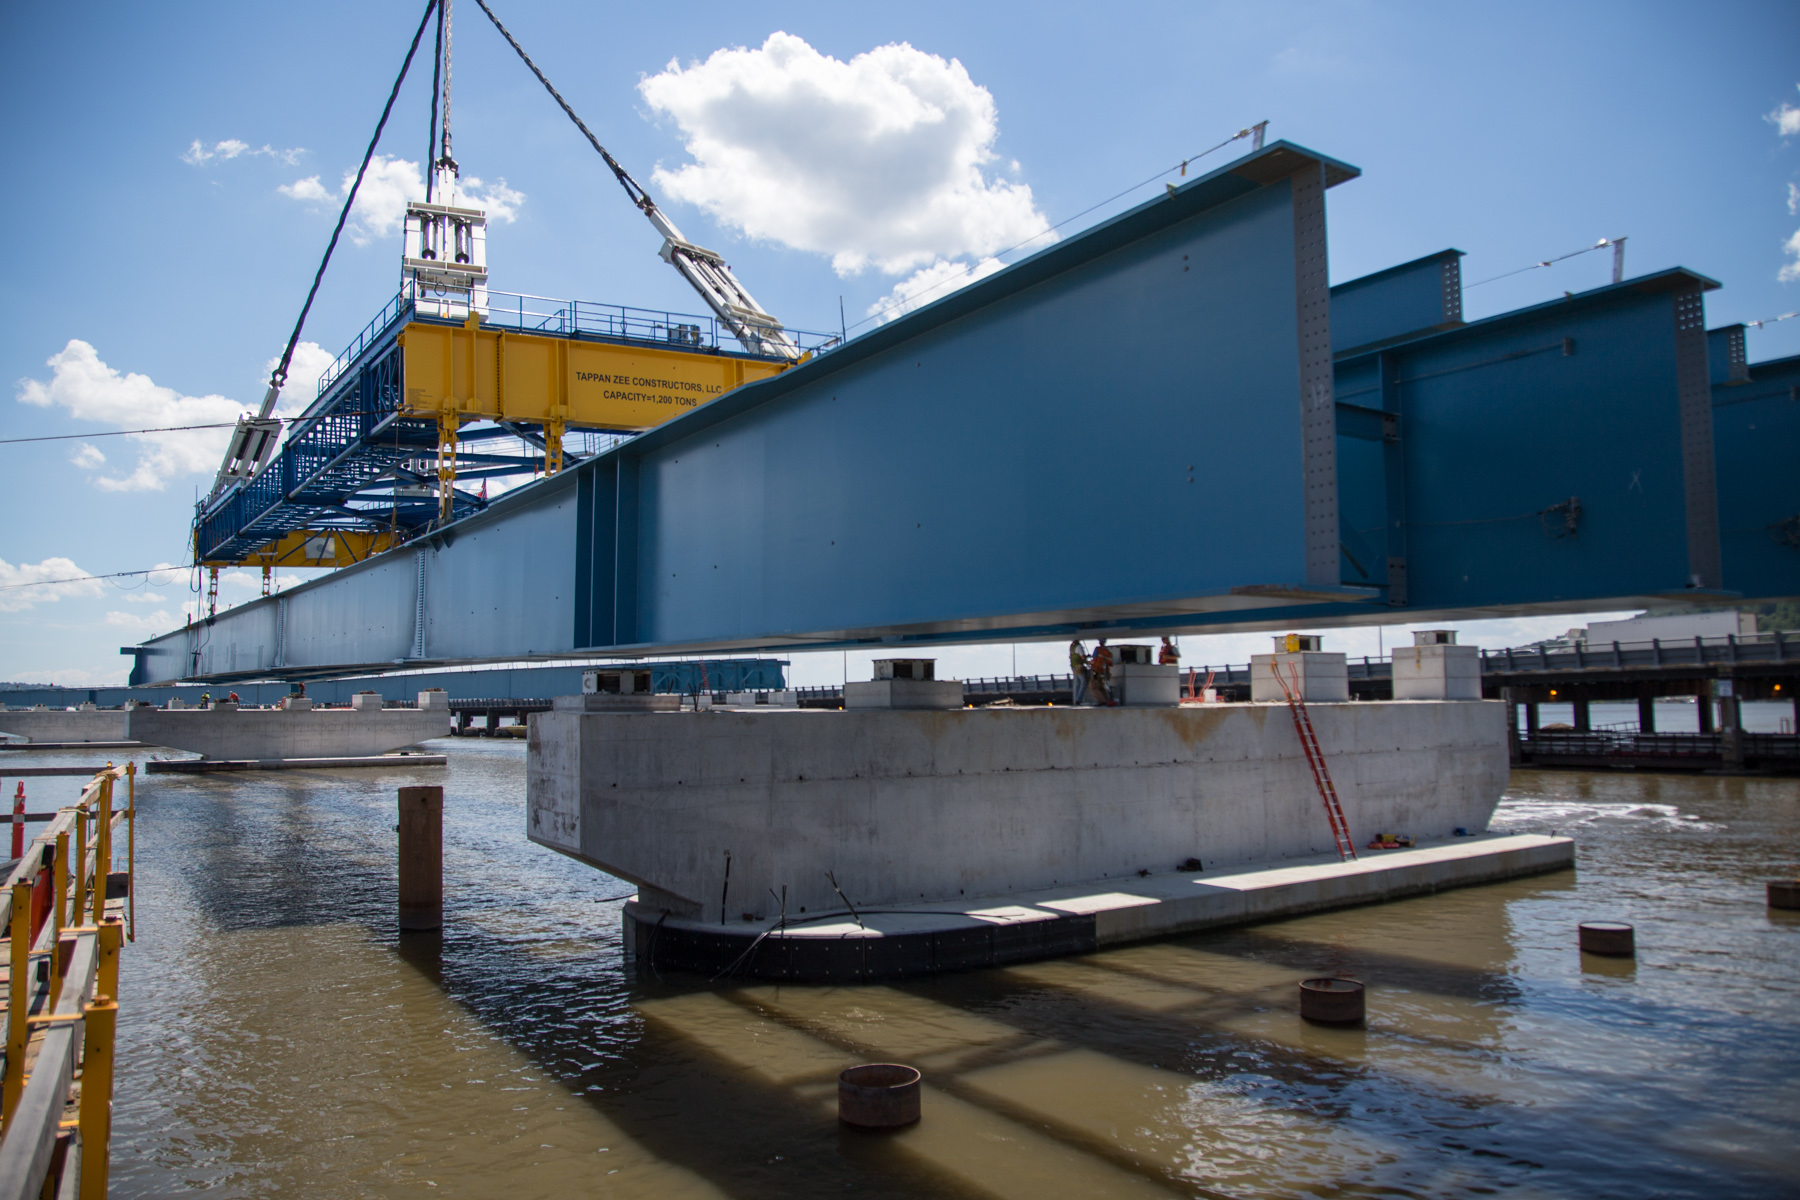 I Lift Ny Supercrane, Westbound, Girder Placement, Girder, Lift, Crane, Pier 4, Pier 5